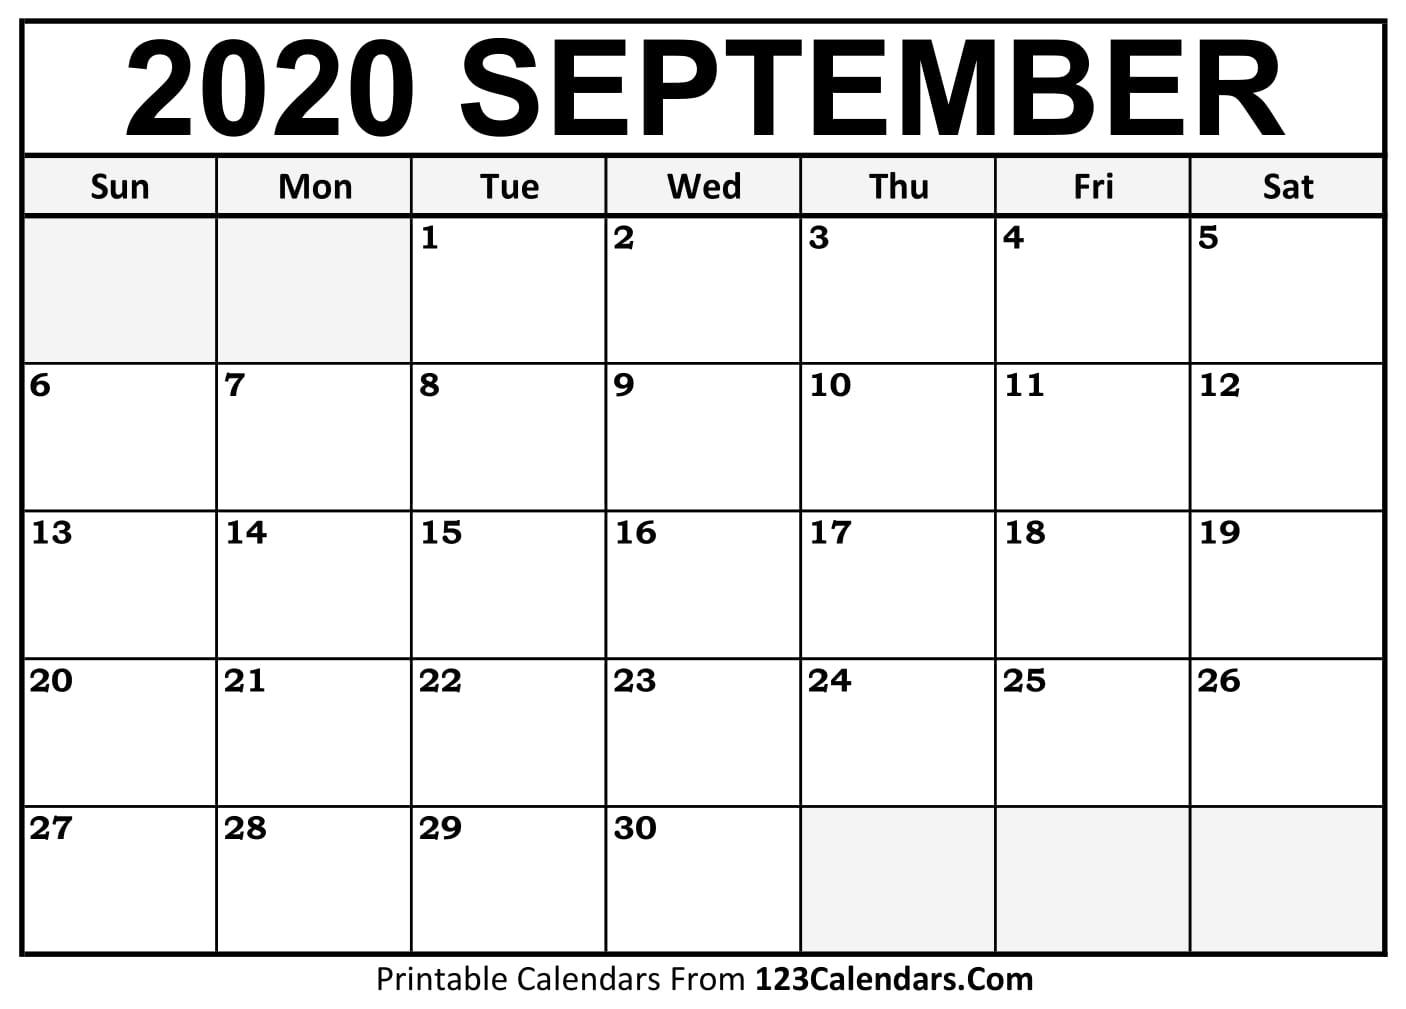 Free September 2020 Calendar | 123Calendars